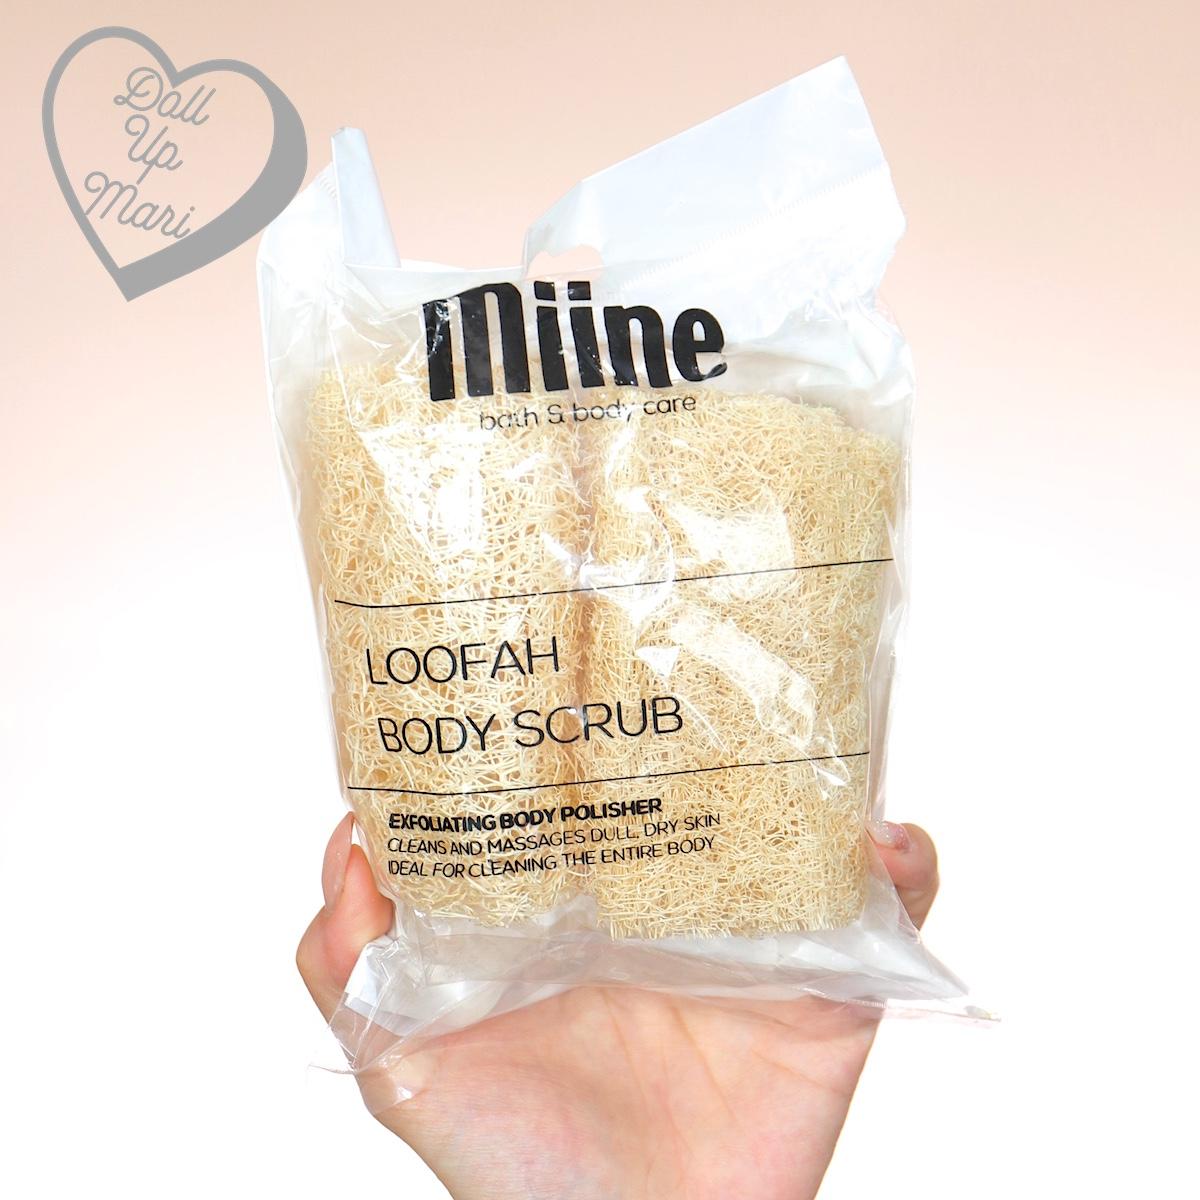 Miine Loofah Body Scrub